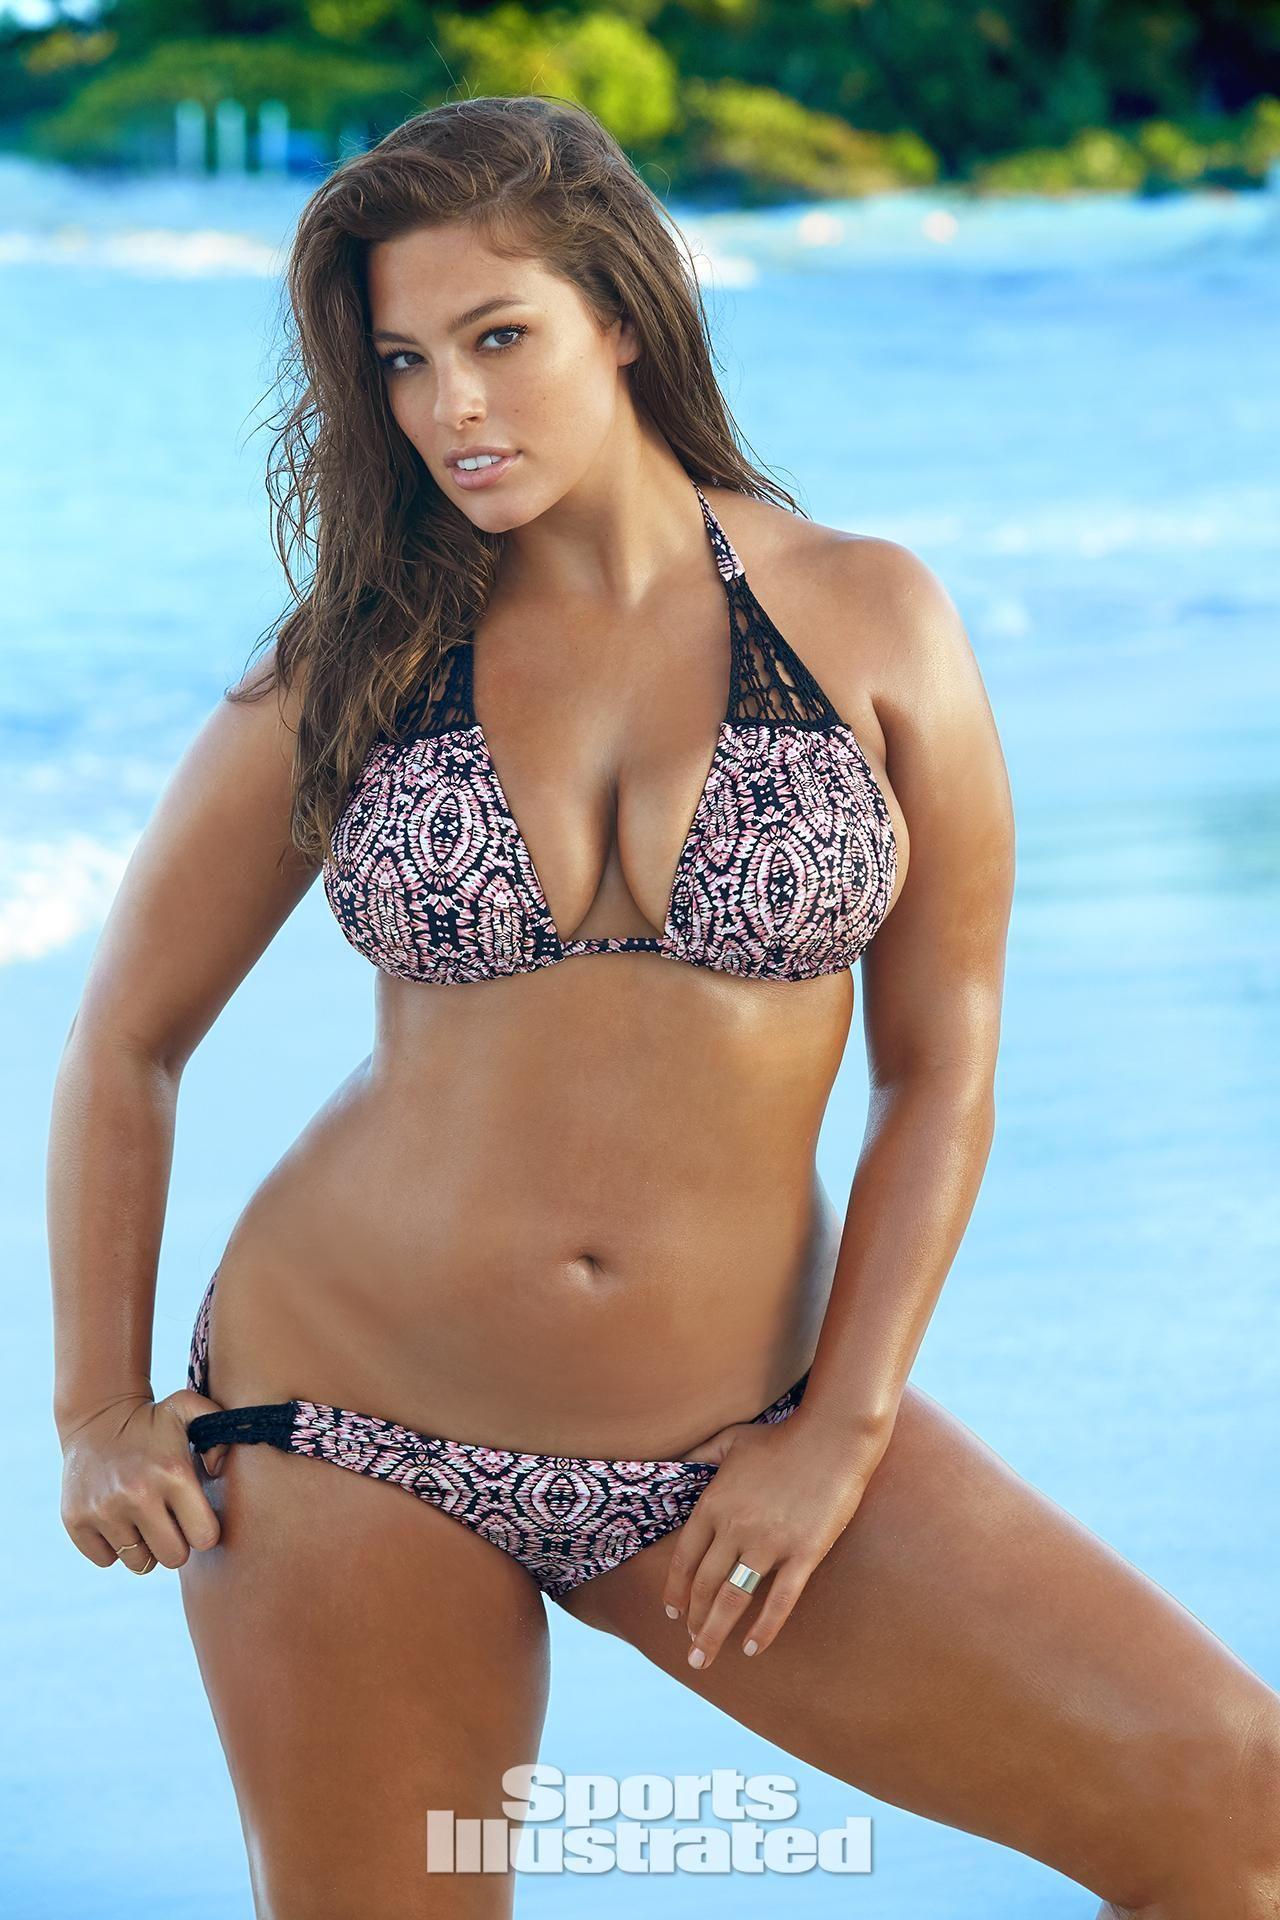 Ashley Graham 2016 Si Swimsuit Photos Swimsuit Models Ashley Graham Sports Illustrated Swimsuit Issue